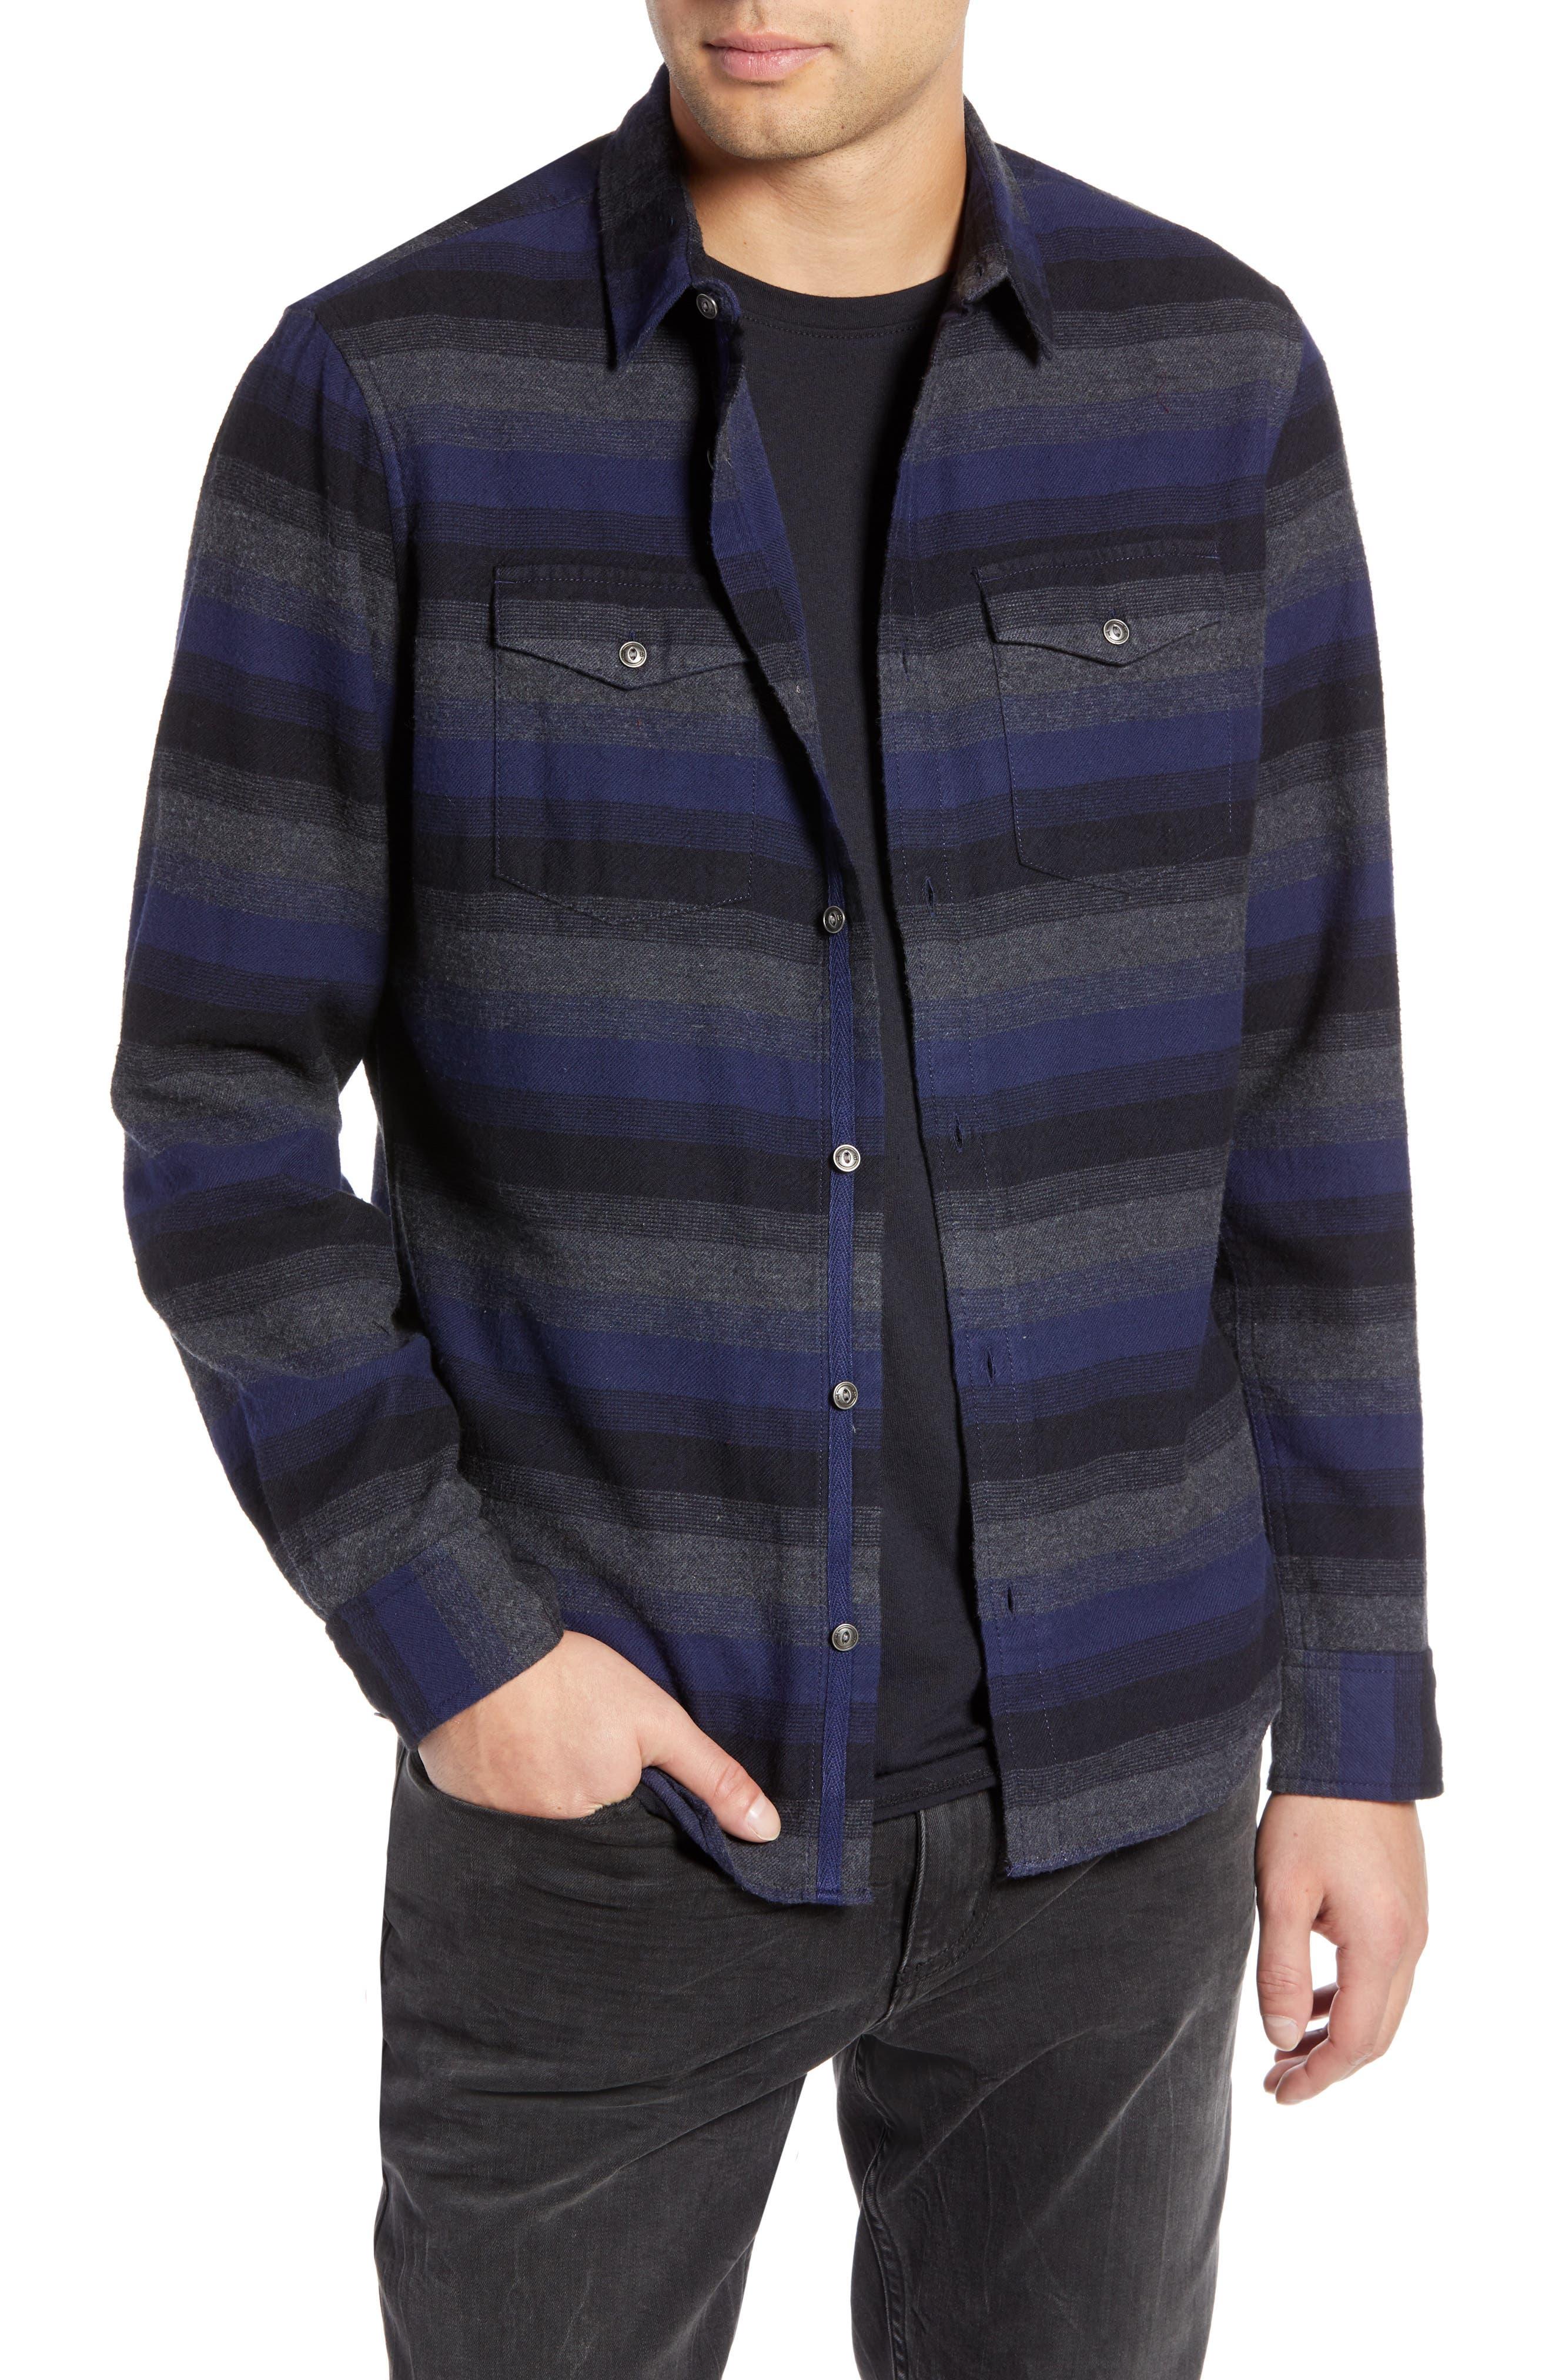 Regular Fit Ombré Sport Shirt,                         Main,                         color, NAVY CHARCOAL OMBRE STRIPE